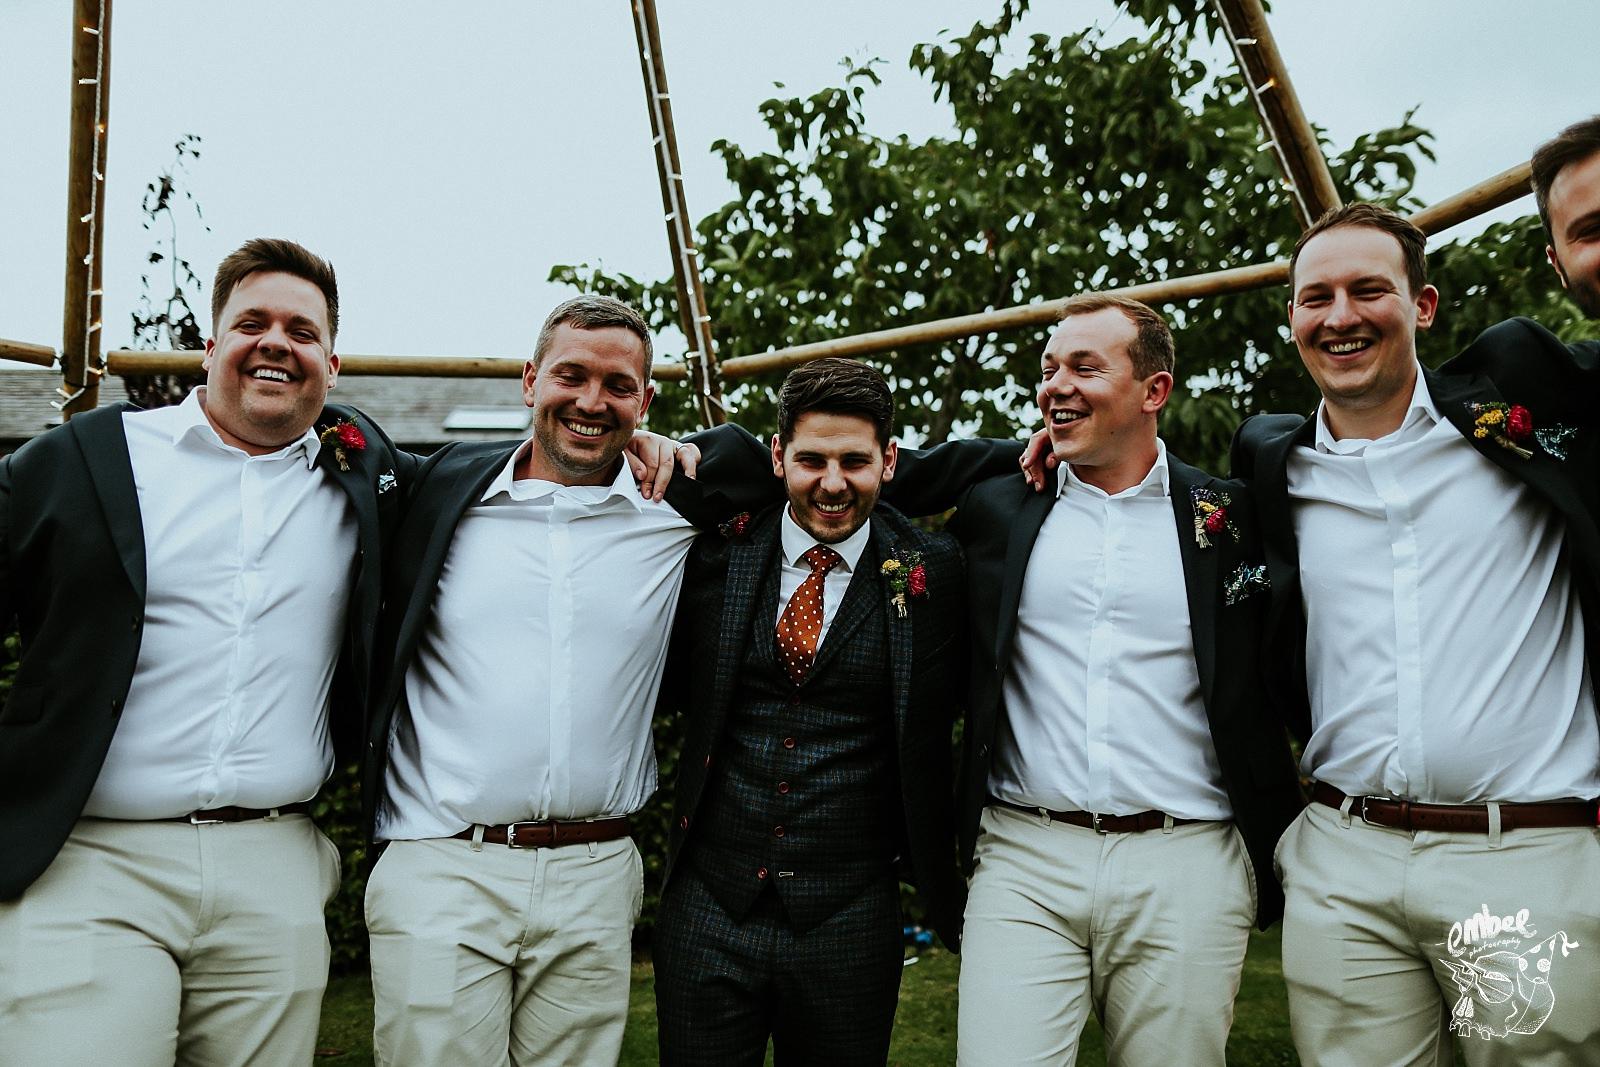 grooms wedding party